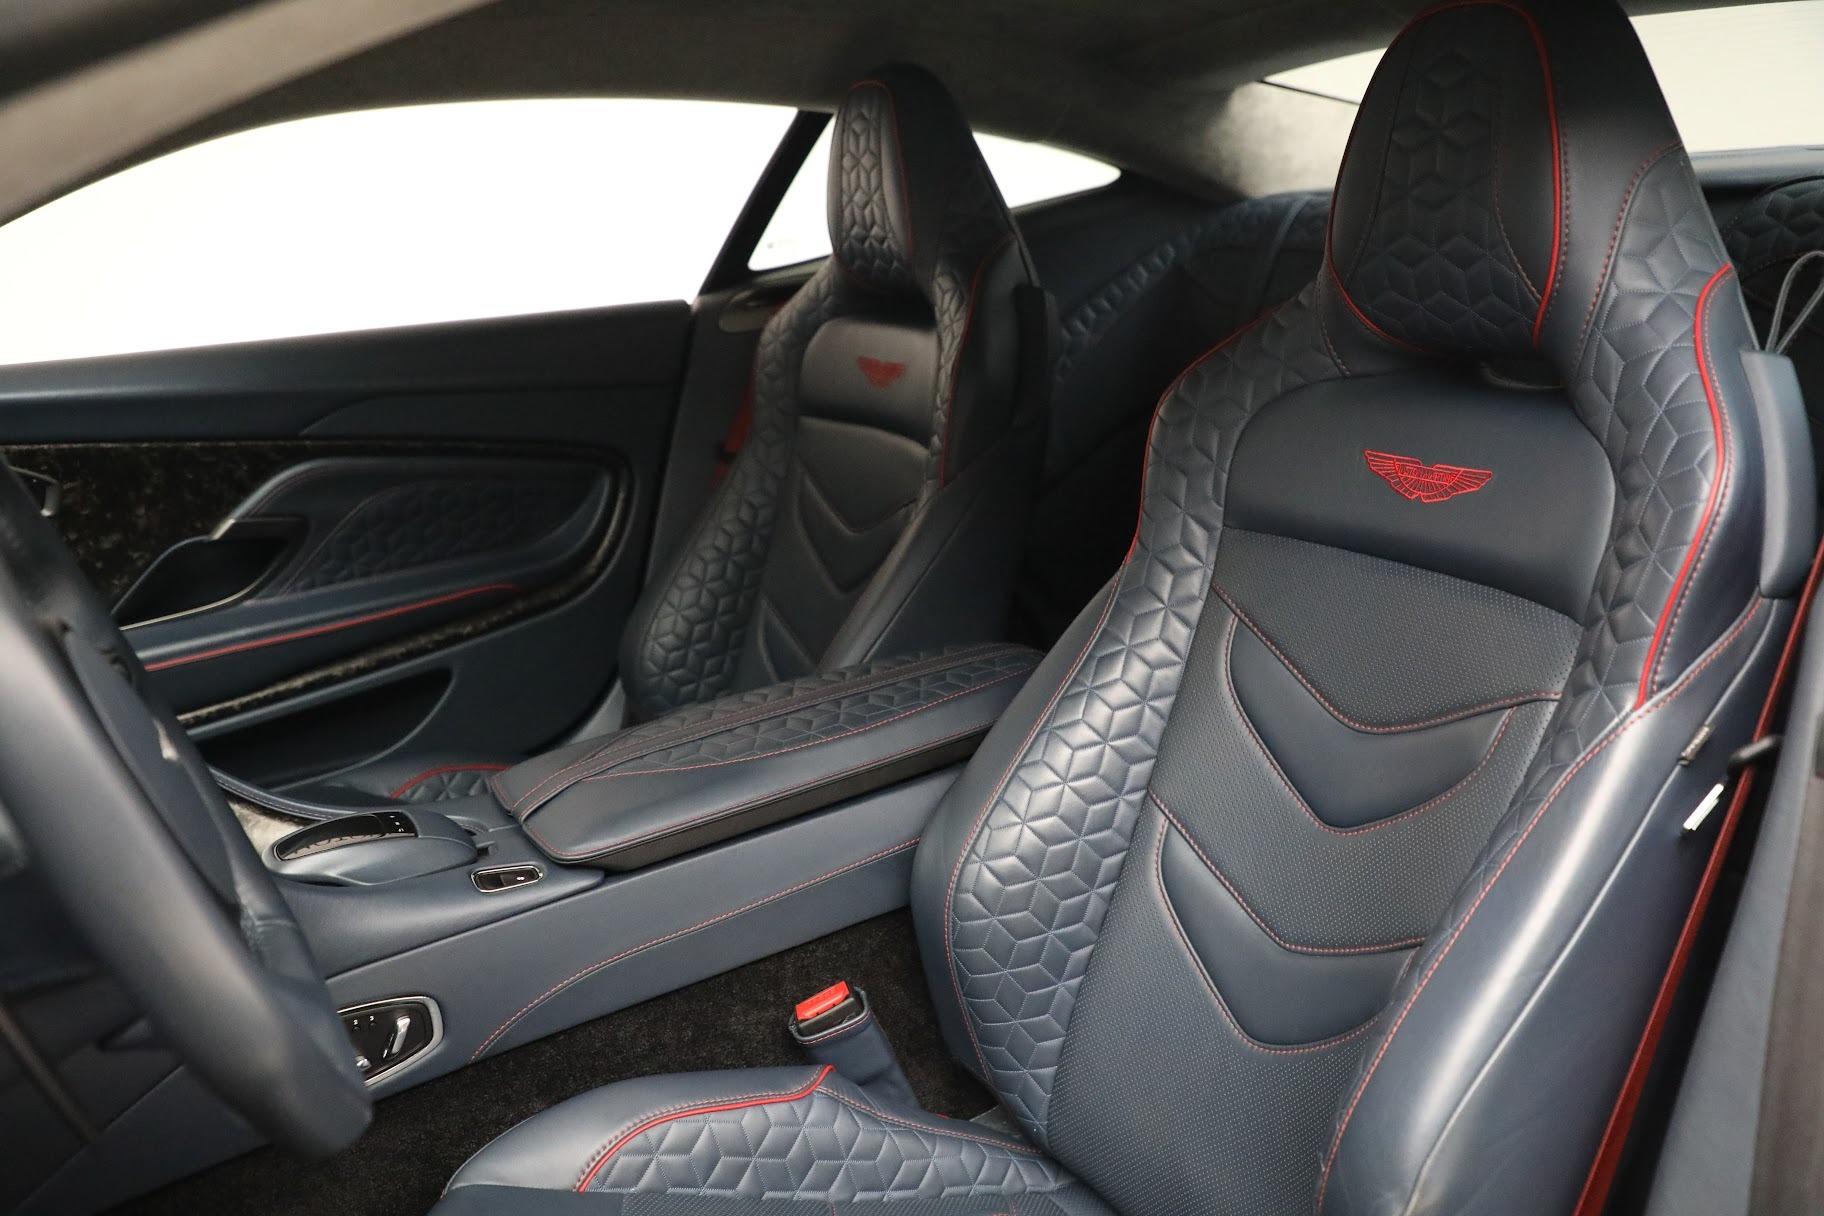 Used 2019 Aston Martin DBS Superleggera For Sale In Greenwich, CT 3471_p15